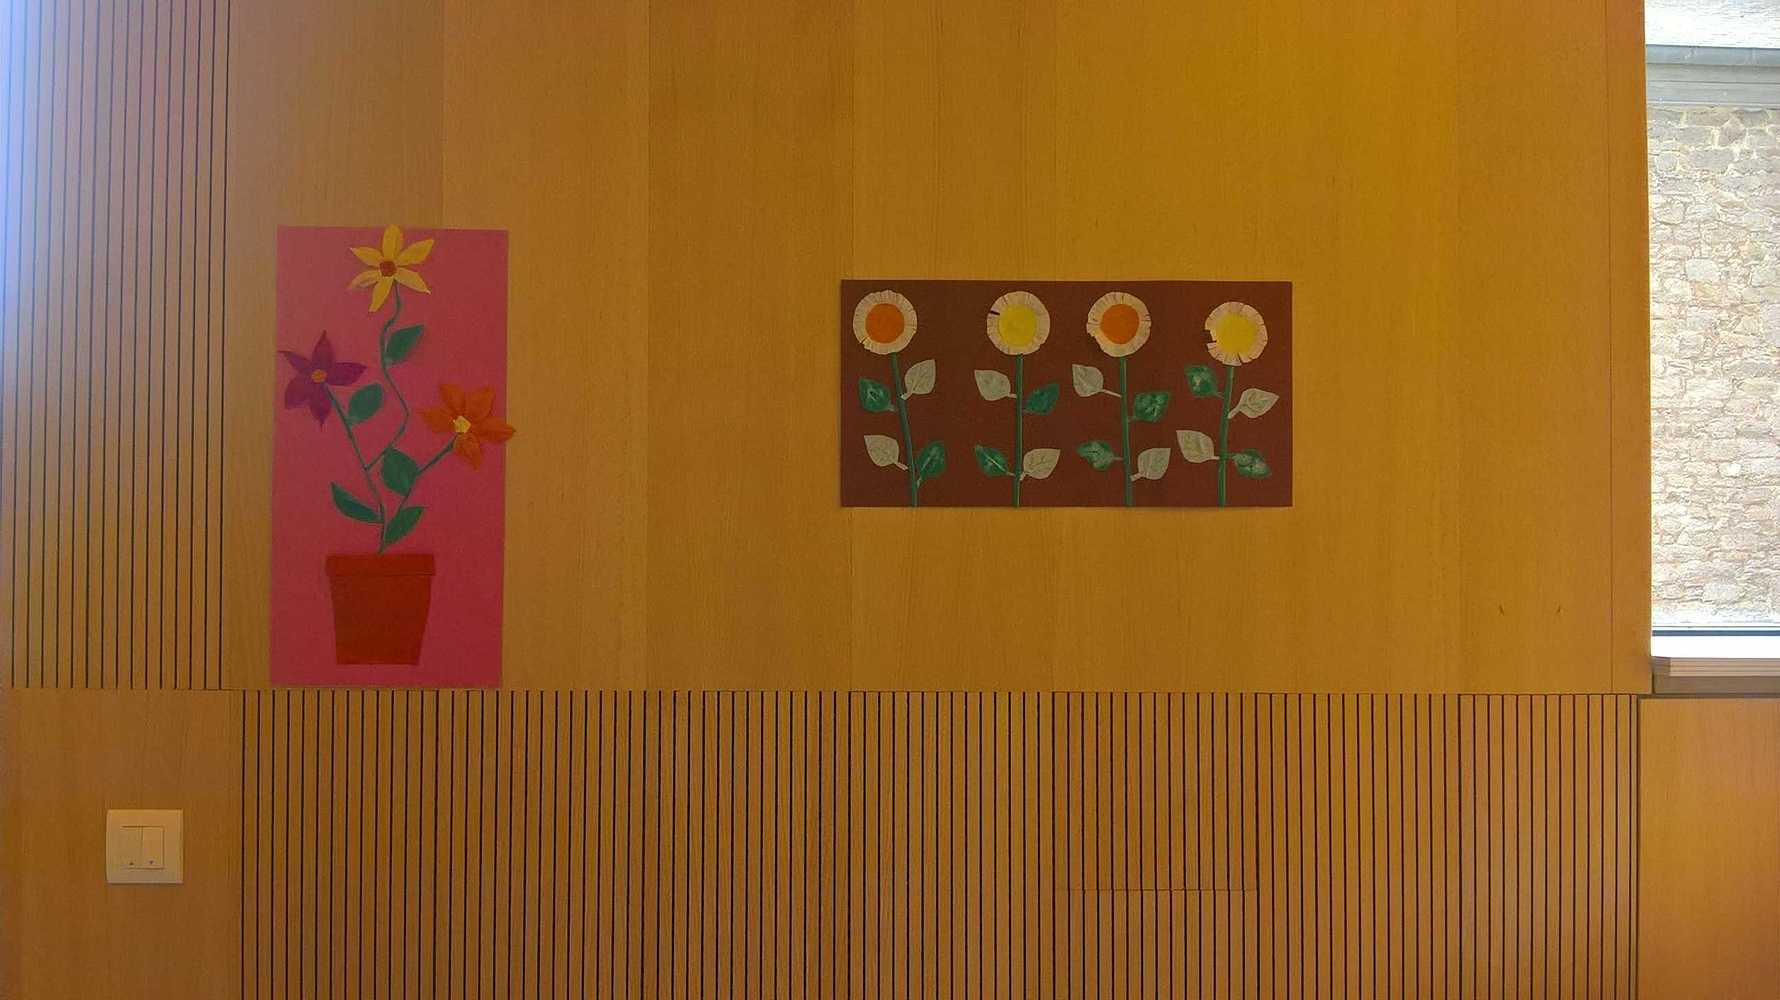 Bibliothèque de Plouguenast - Vendredi 21 Juillet 2017 wp20170721115350pro